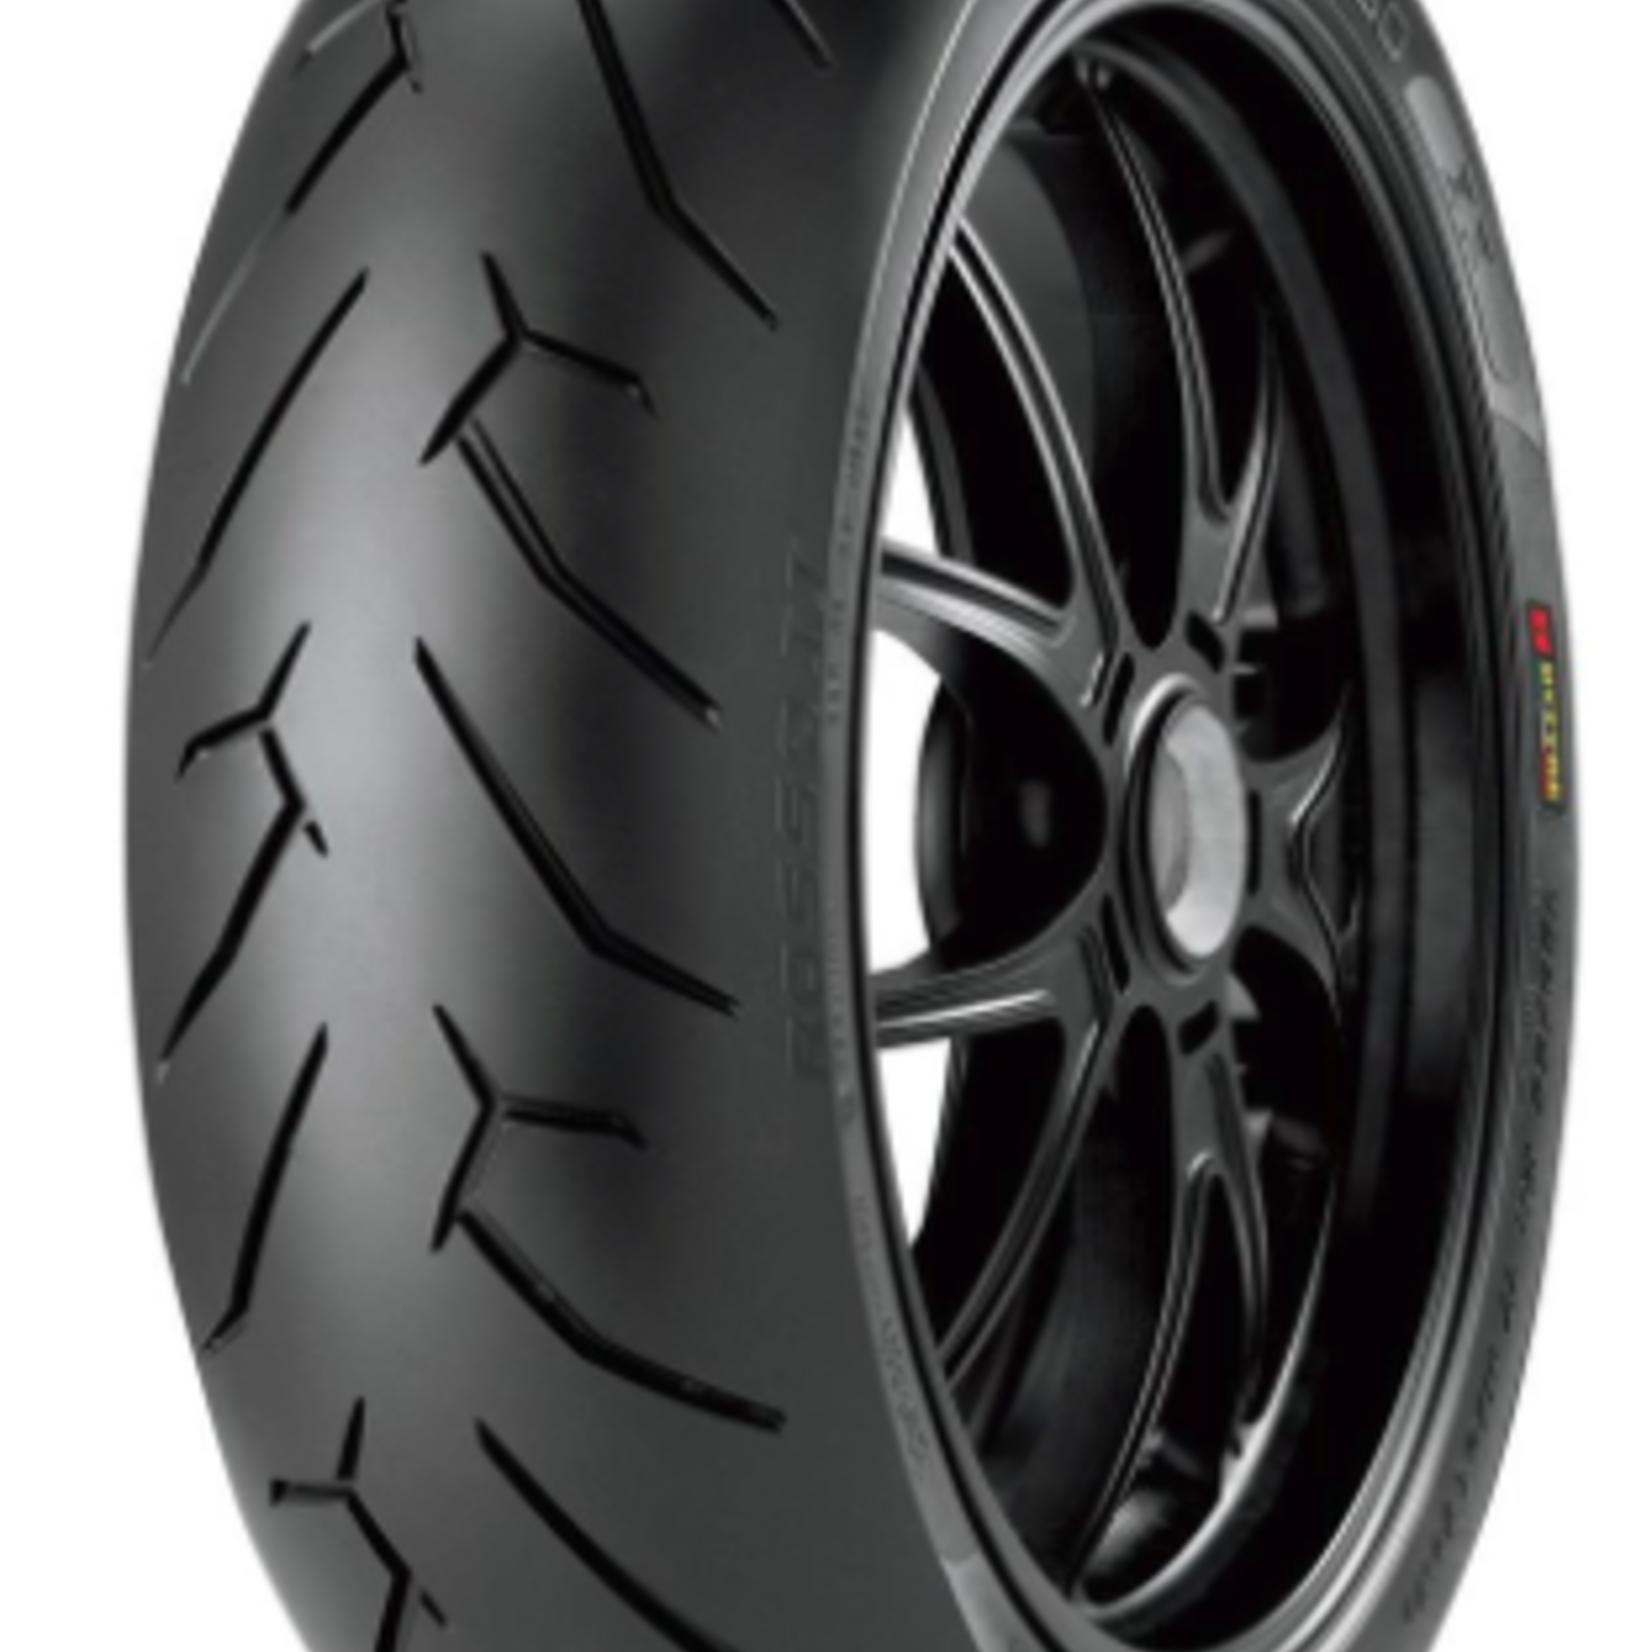 Pirelli Pirelli Street Diablo Rosso II Supersport Rear Tire - 180/55-17